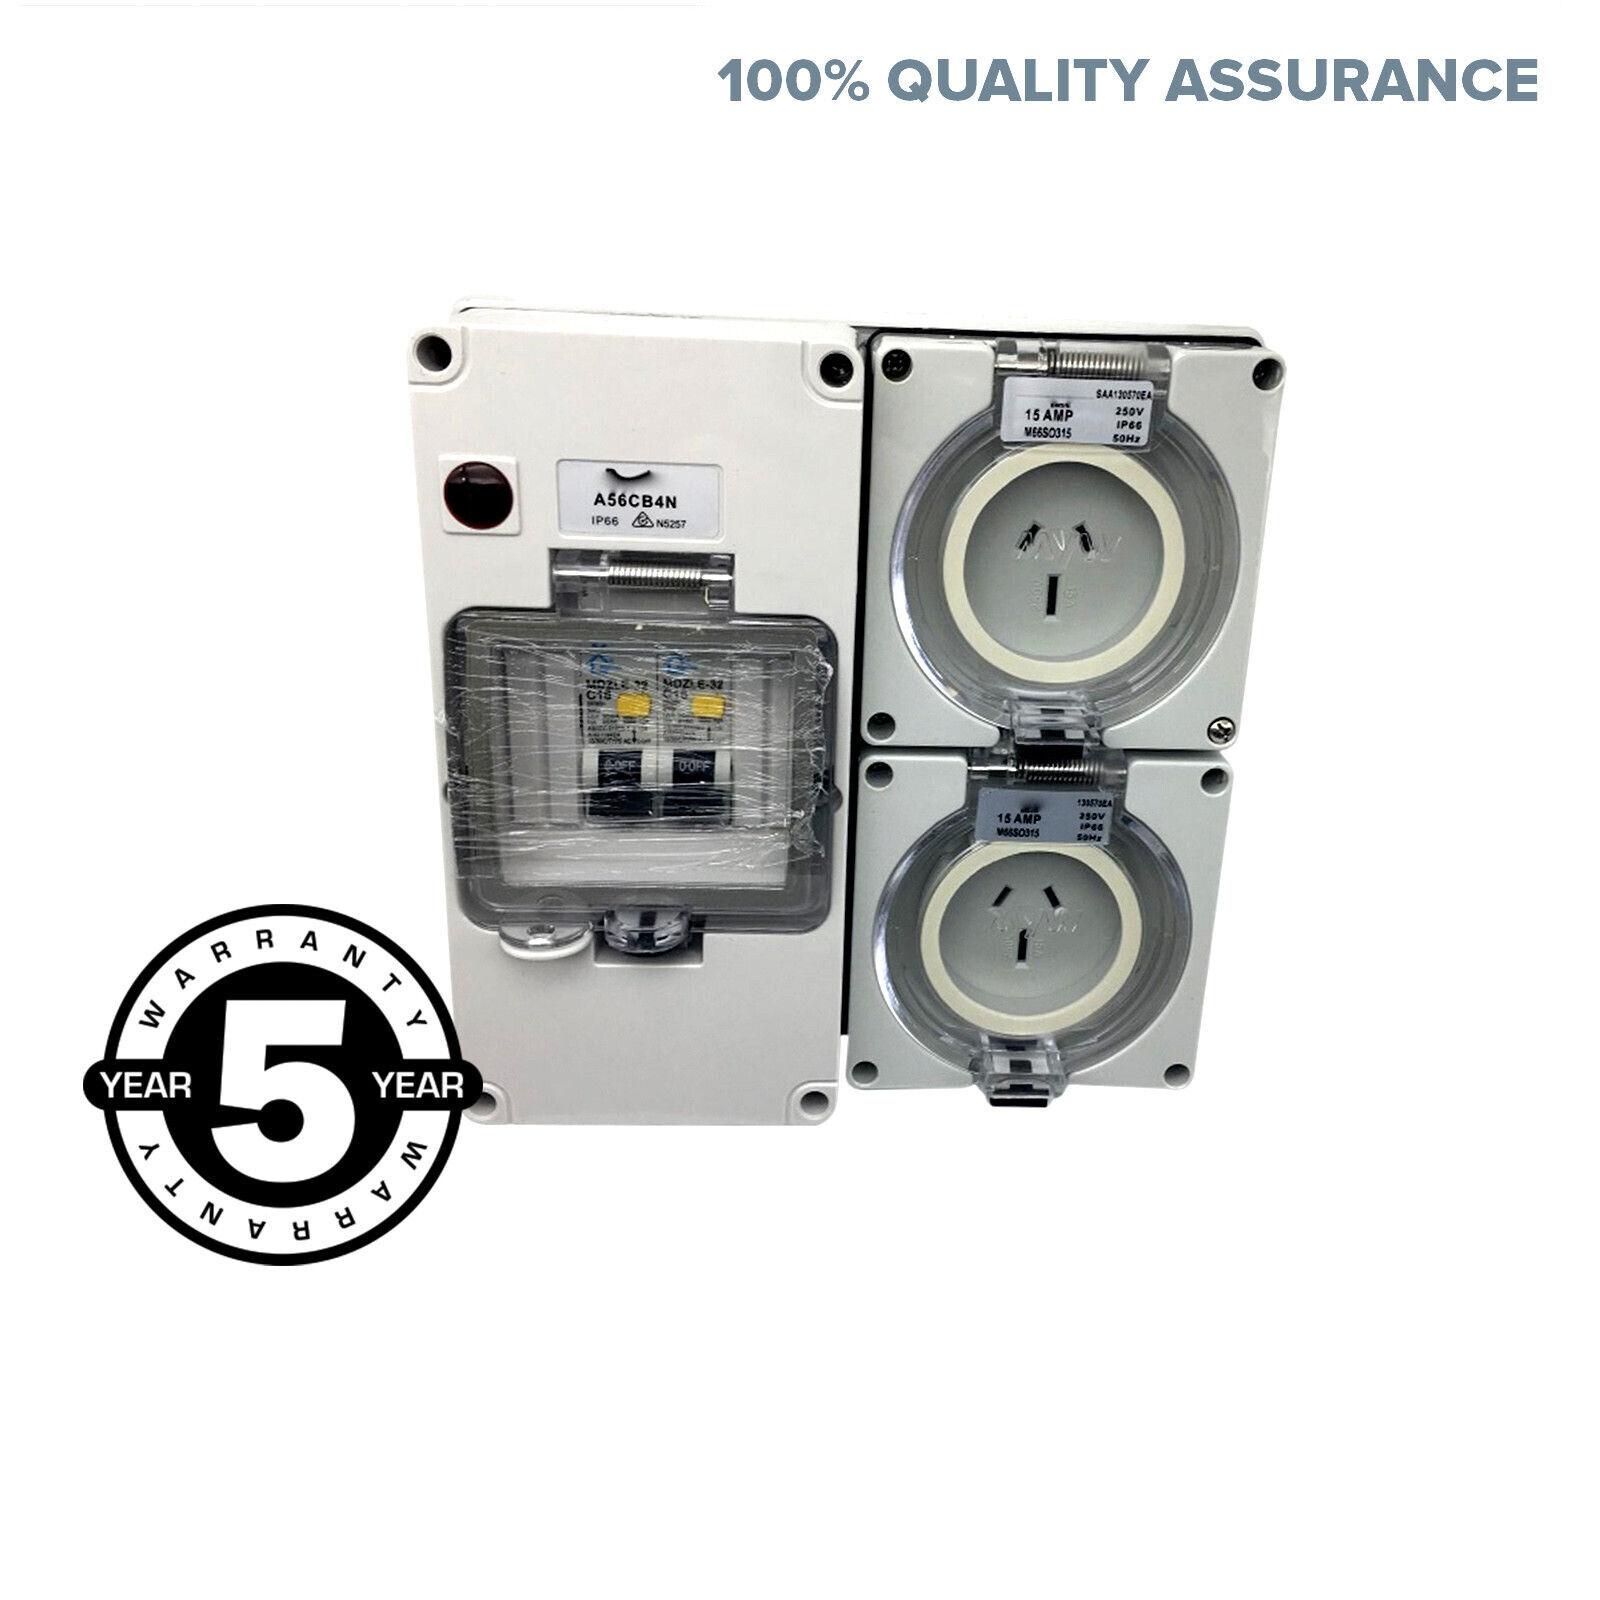 2x 15 Amp 3 Pin Socket Rcd Mcb Outlet Switchboard 4 Pole Ip66 Weatherproof Rcbo Ebay